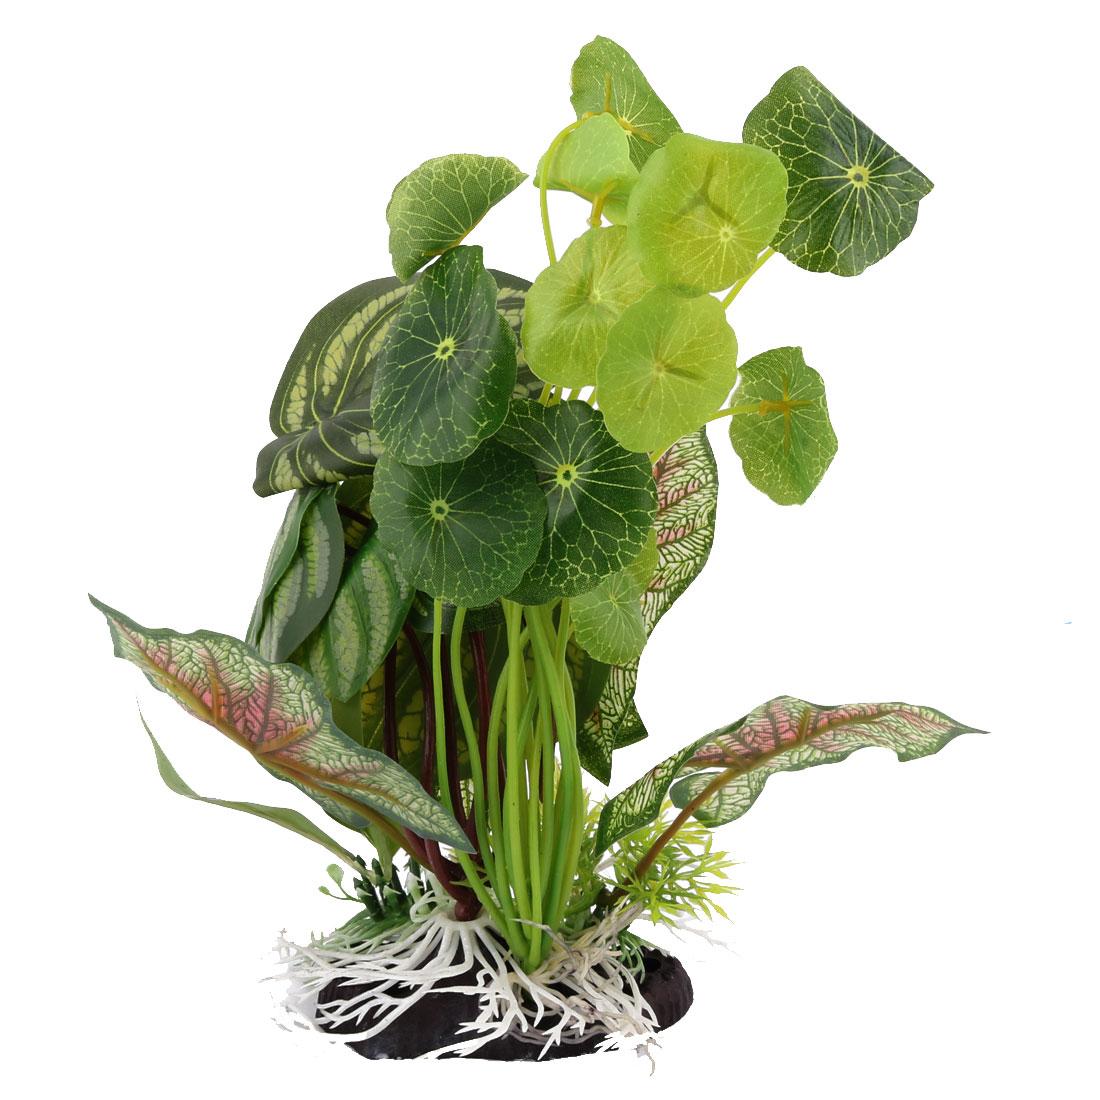 Fish-Tank-Aquarium-Stone-Base-Plastic-Artificial-Landscape-Plant-Grass-Decor